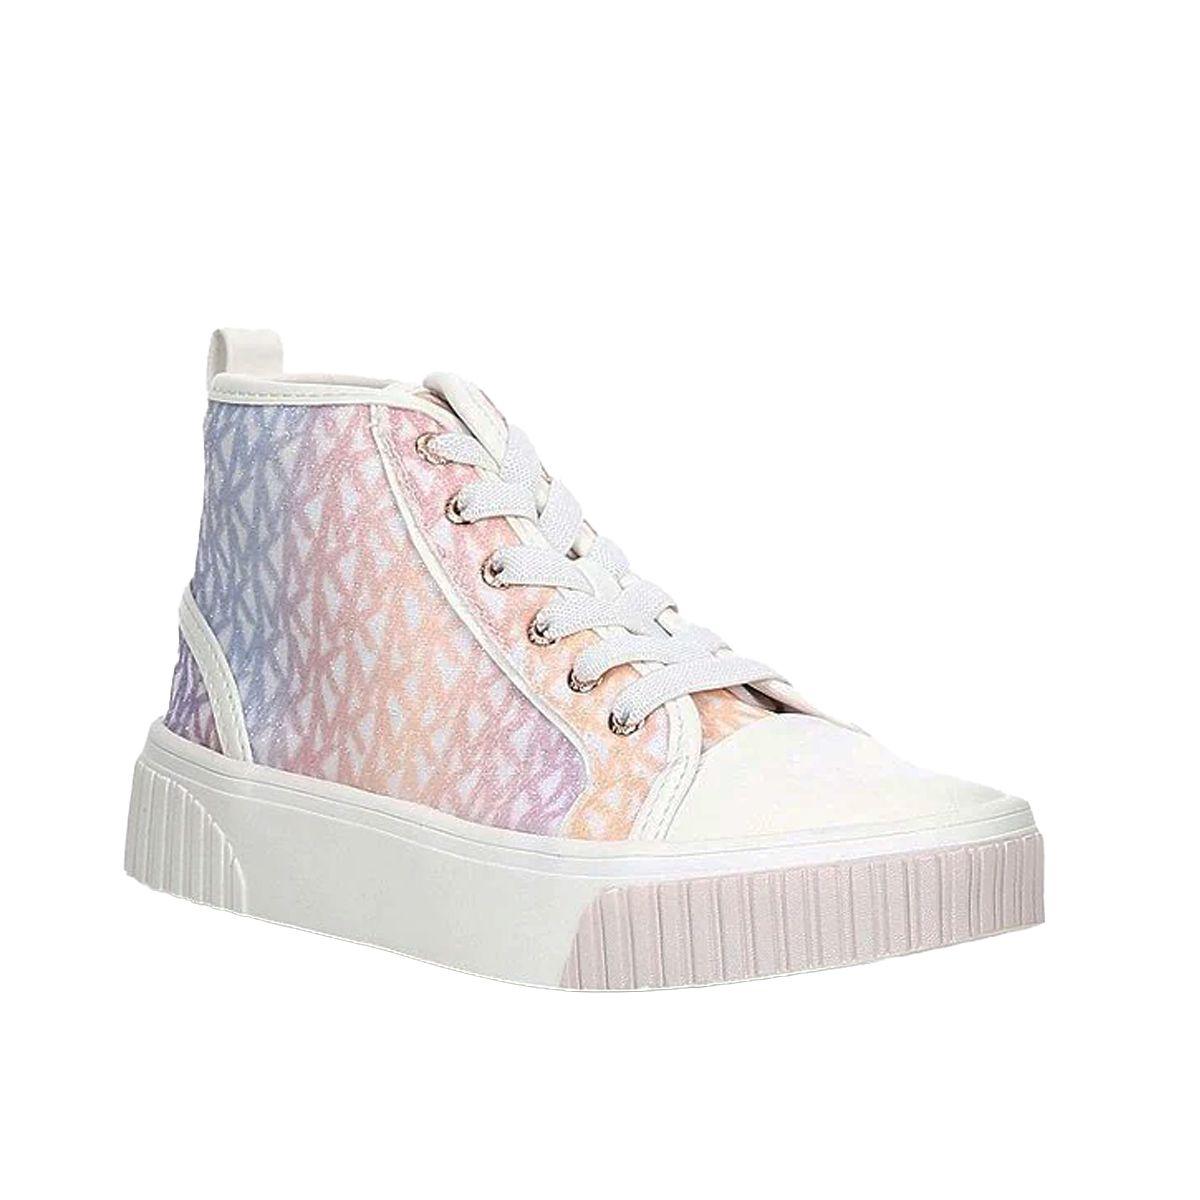 נעלי MICHAEL KORS SKATE SPLIT לילדות